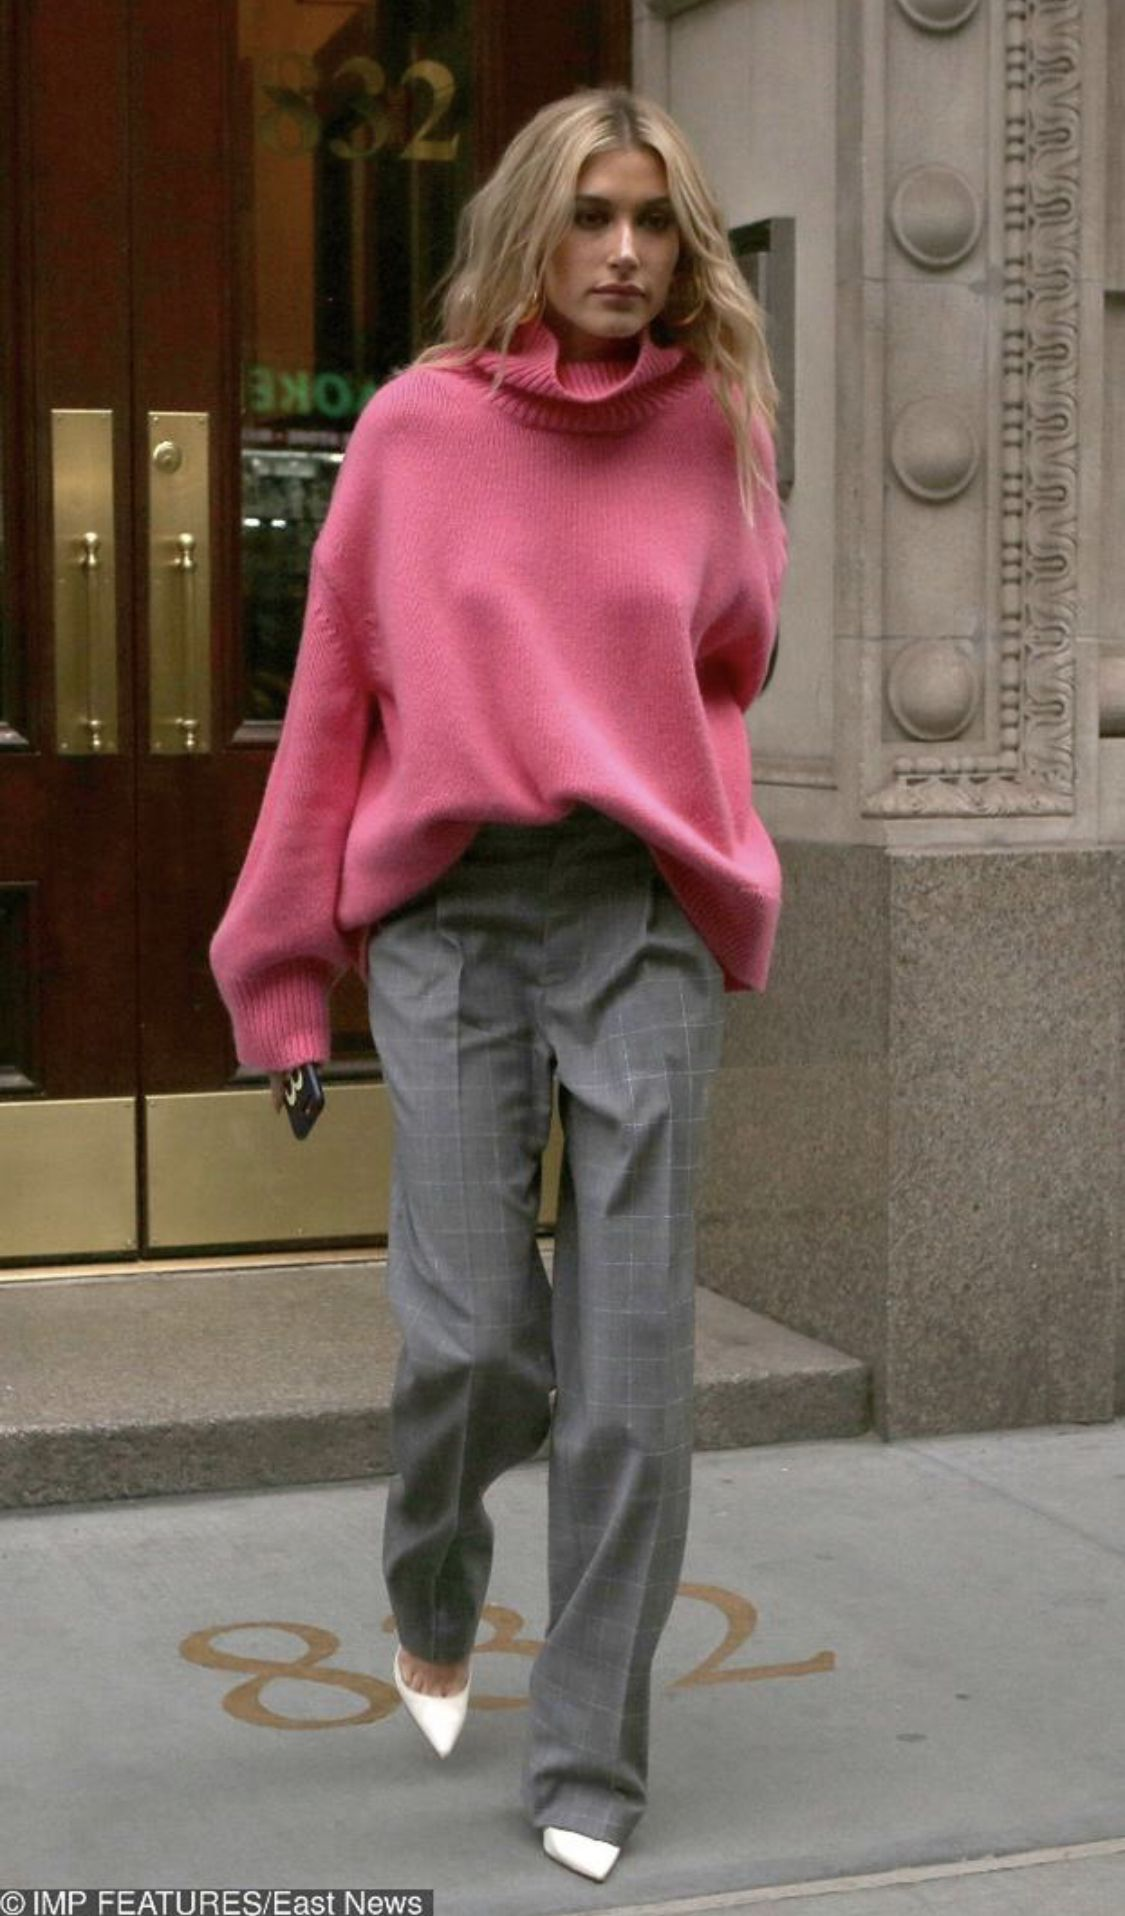 Hailey Baldwin in pink jumper & grey suit